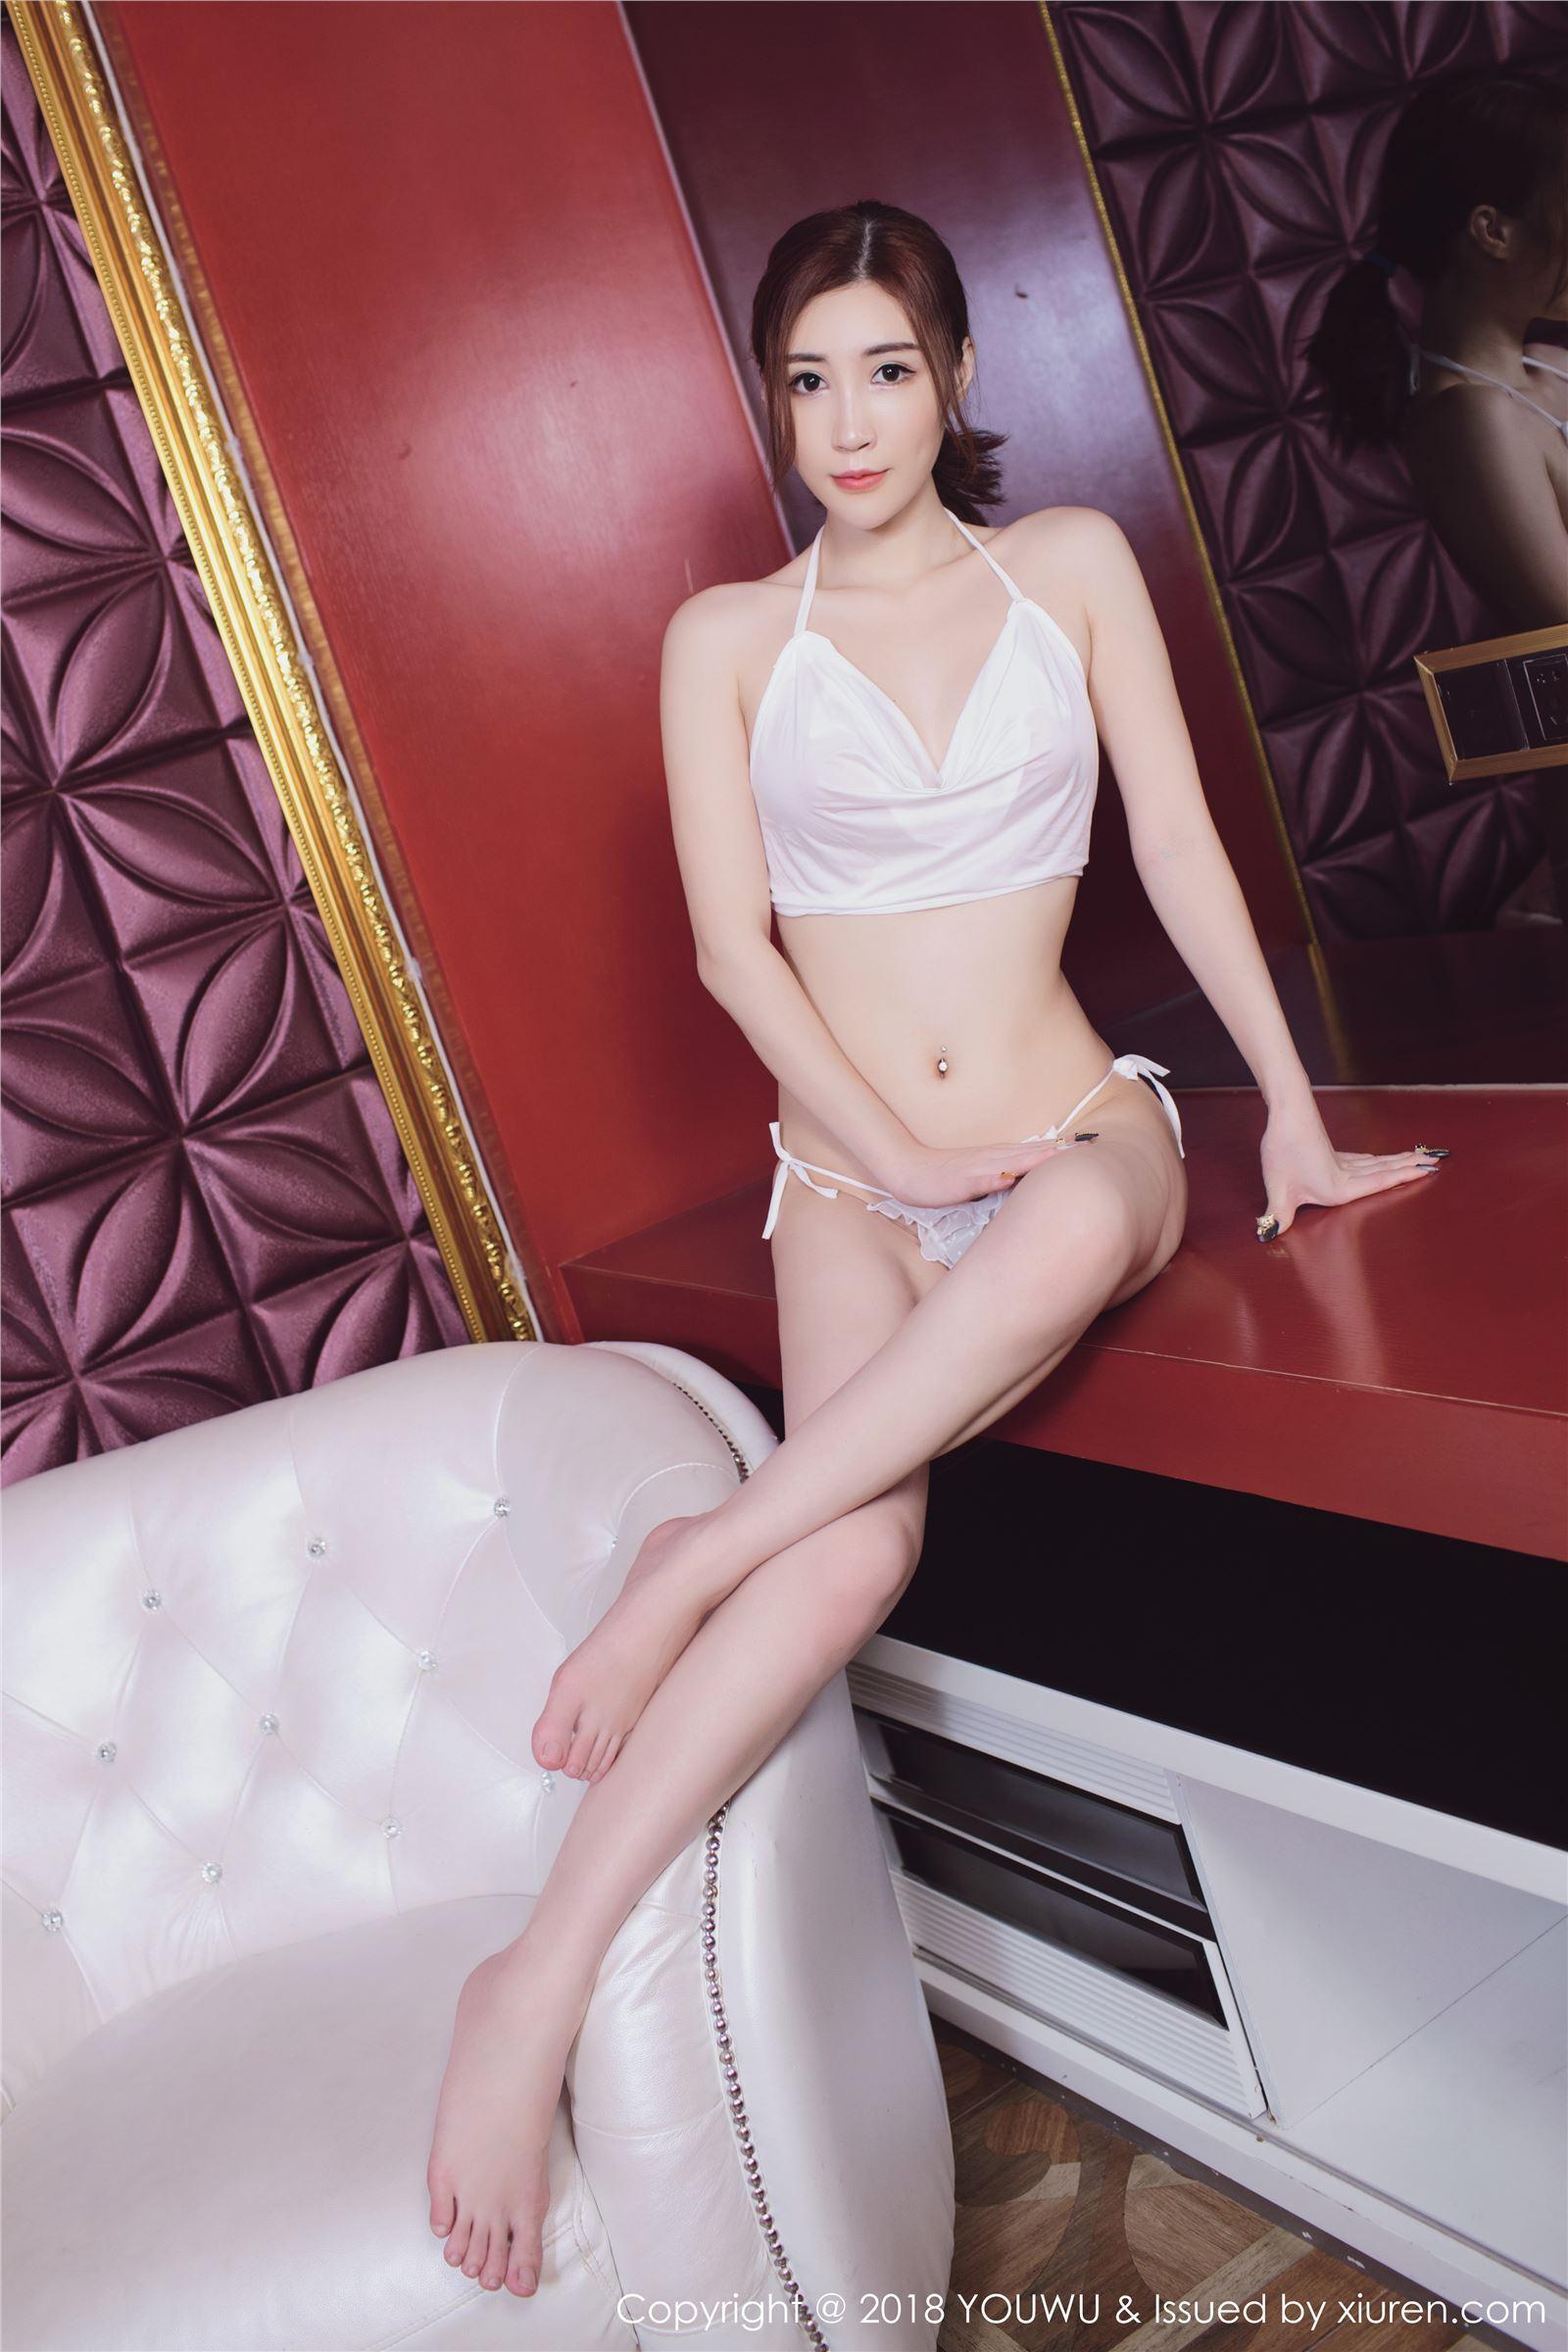 YOUWU尤物馆 2018.09.05 Vol.116 孙梦瑶V